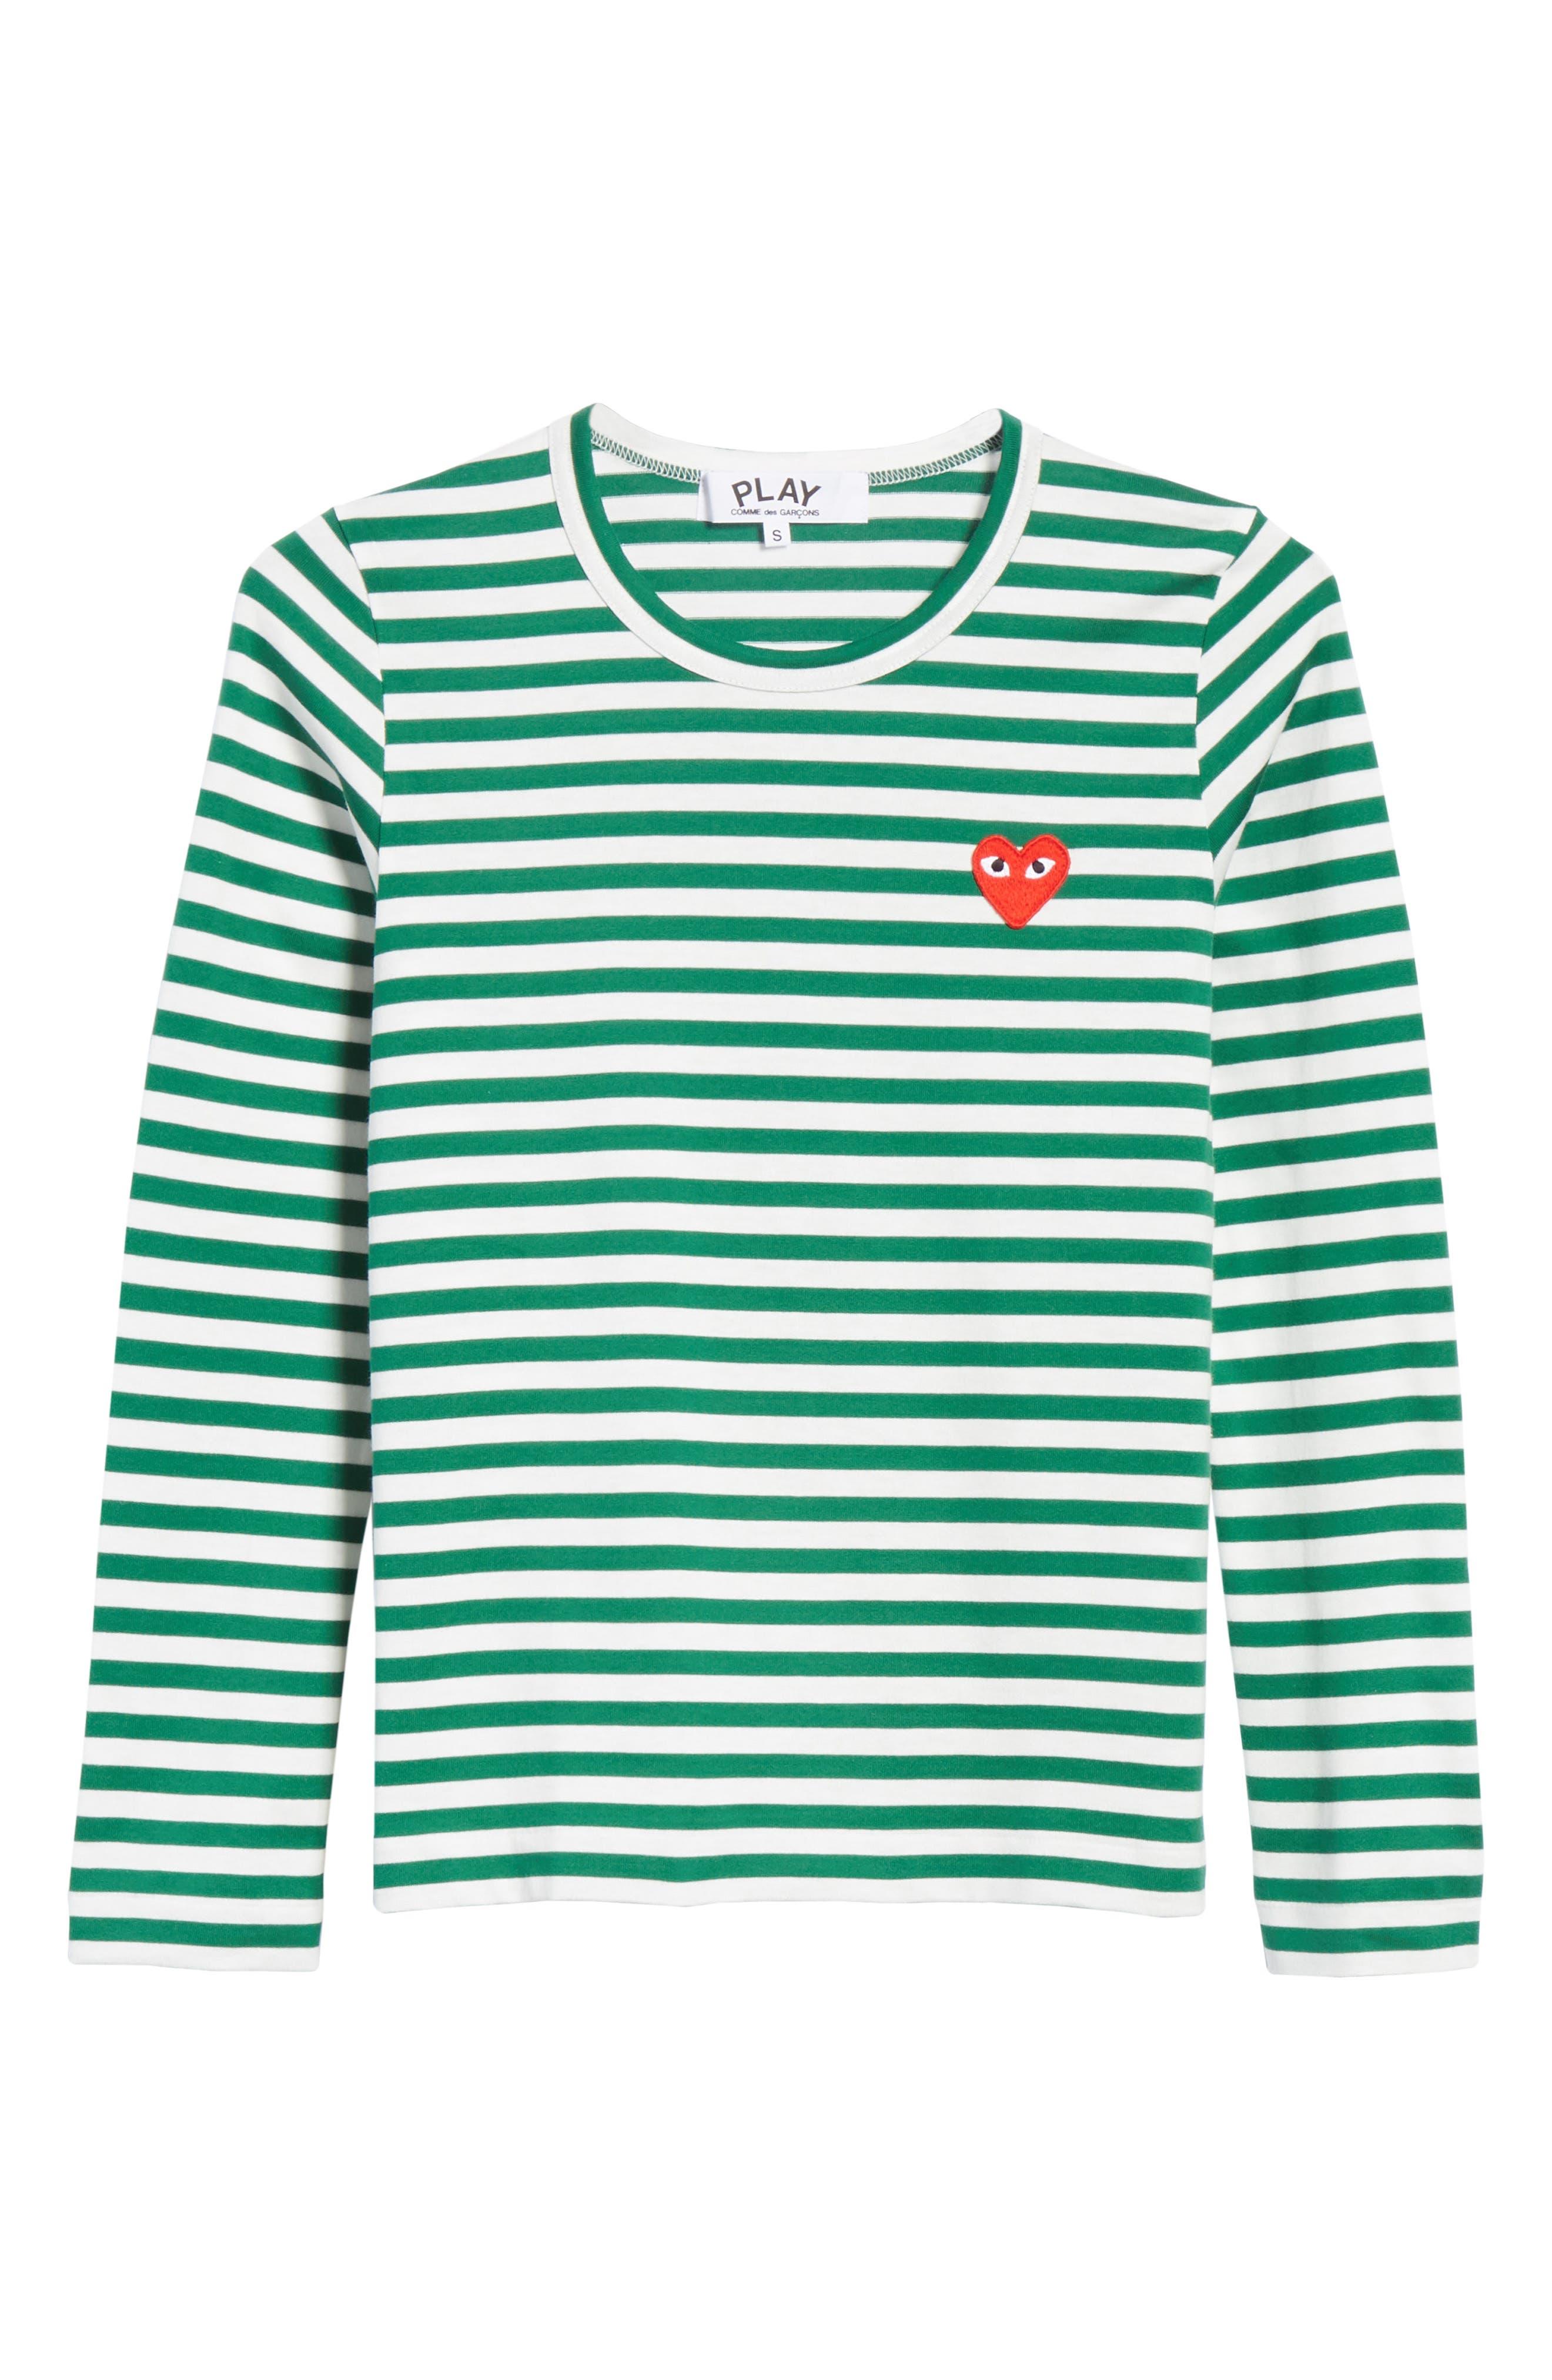 Comme des Garçons PLAY Stripe Cotton Tee,                             Alternate thumbnail 6, color,                             GREEN/ WHITE